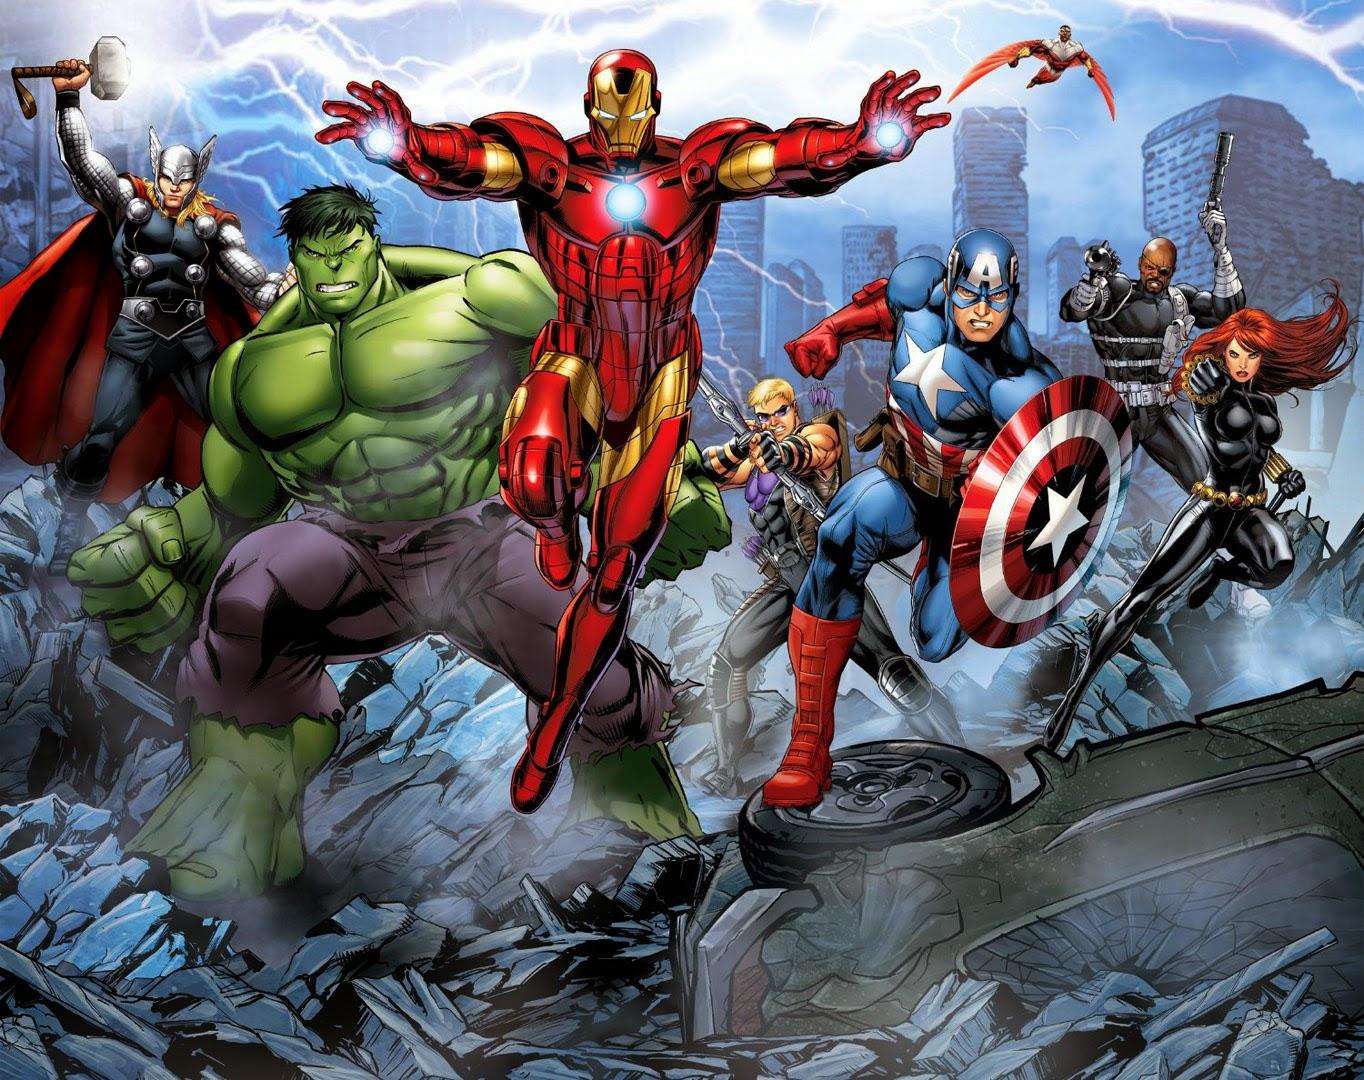 Avenger Assemble - Film Animation Cartoon HD